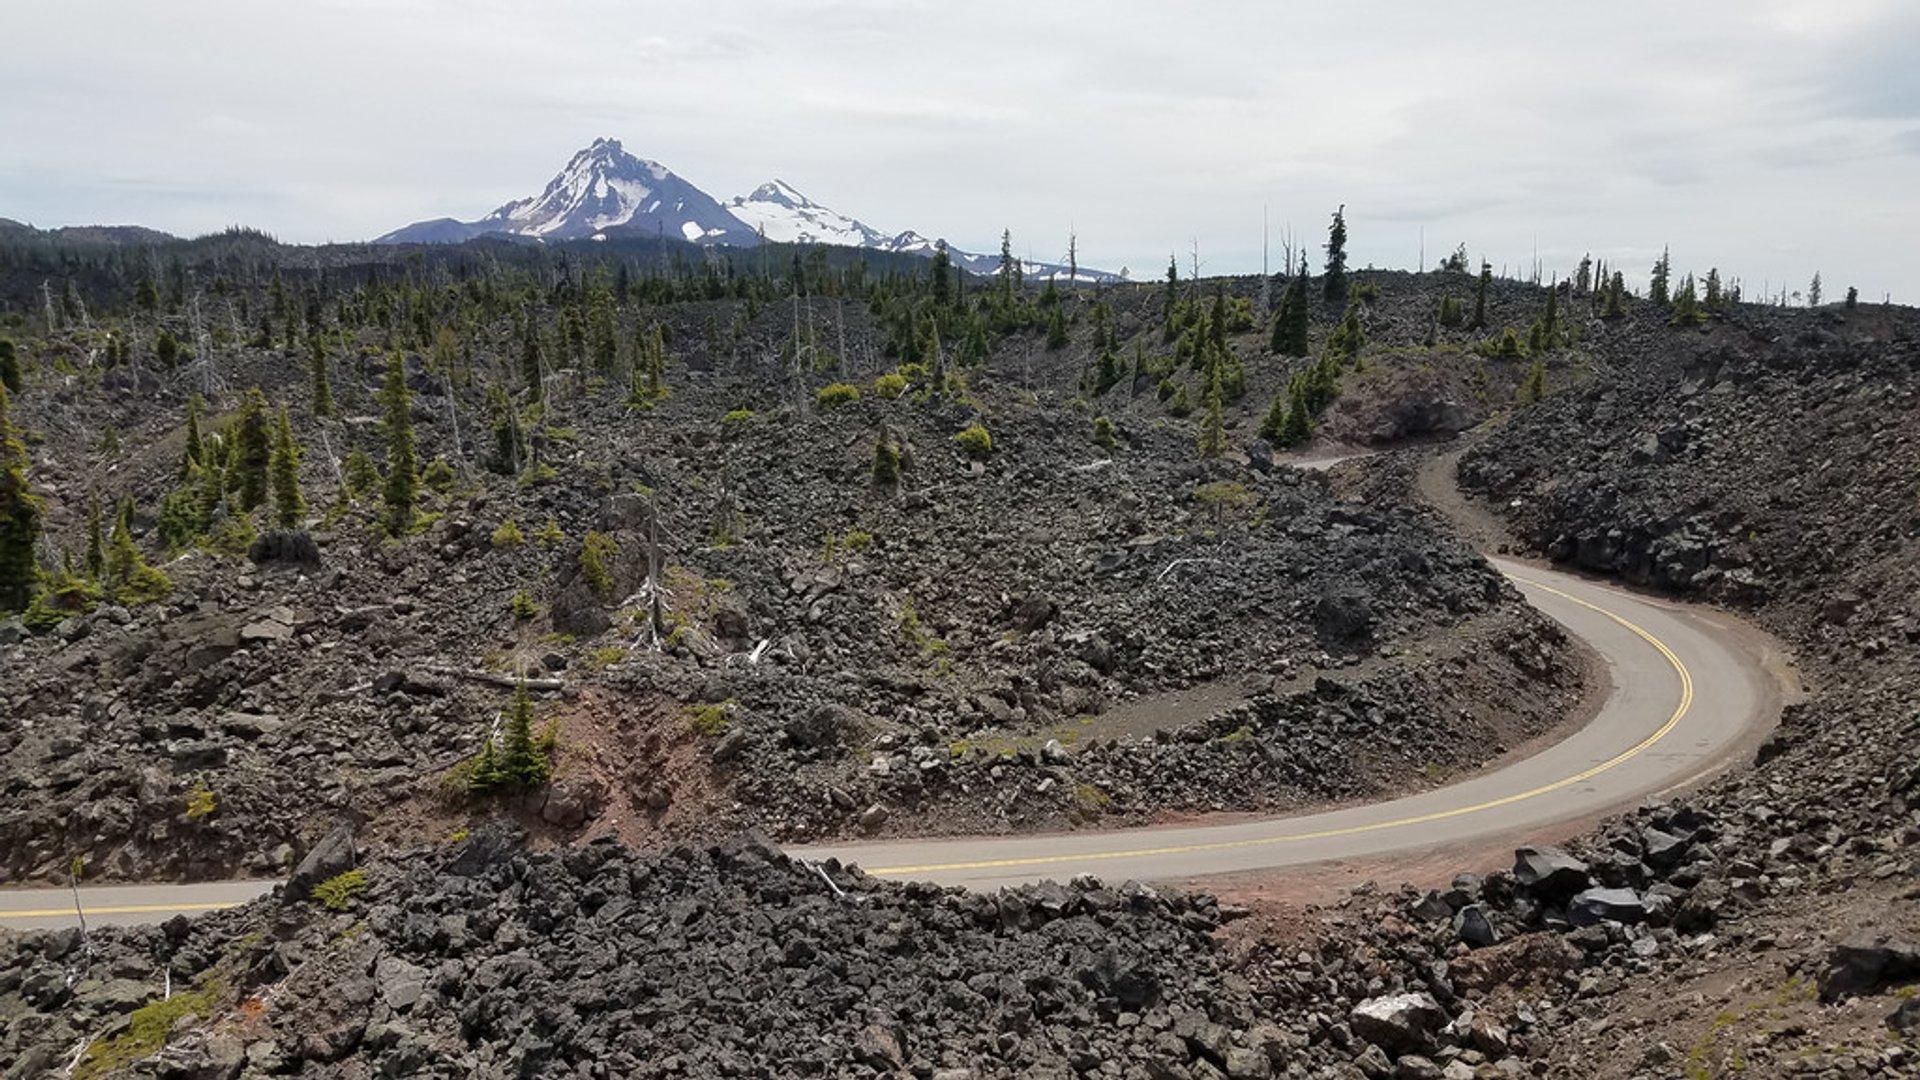 McKenzie Pass in Portland 2019 - Best Time